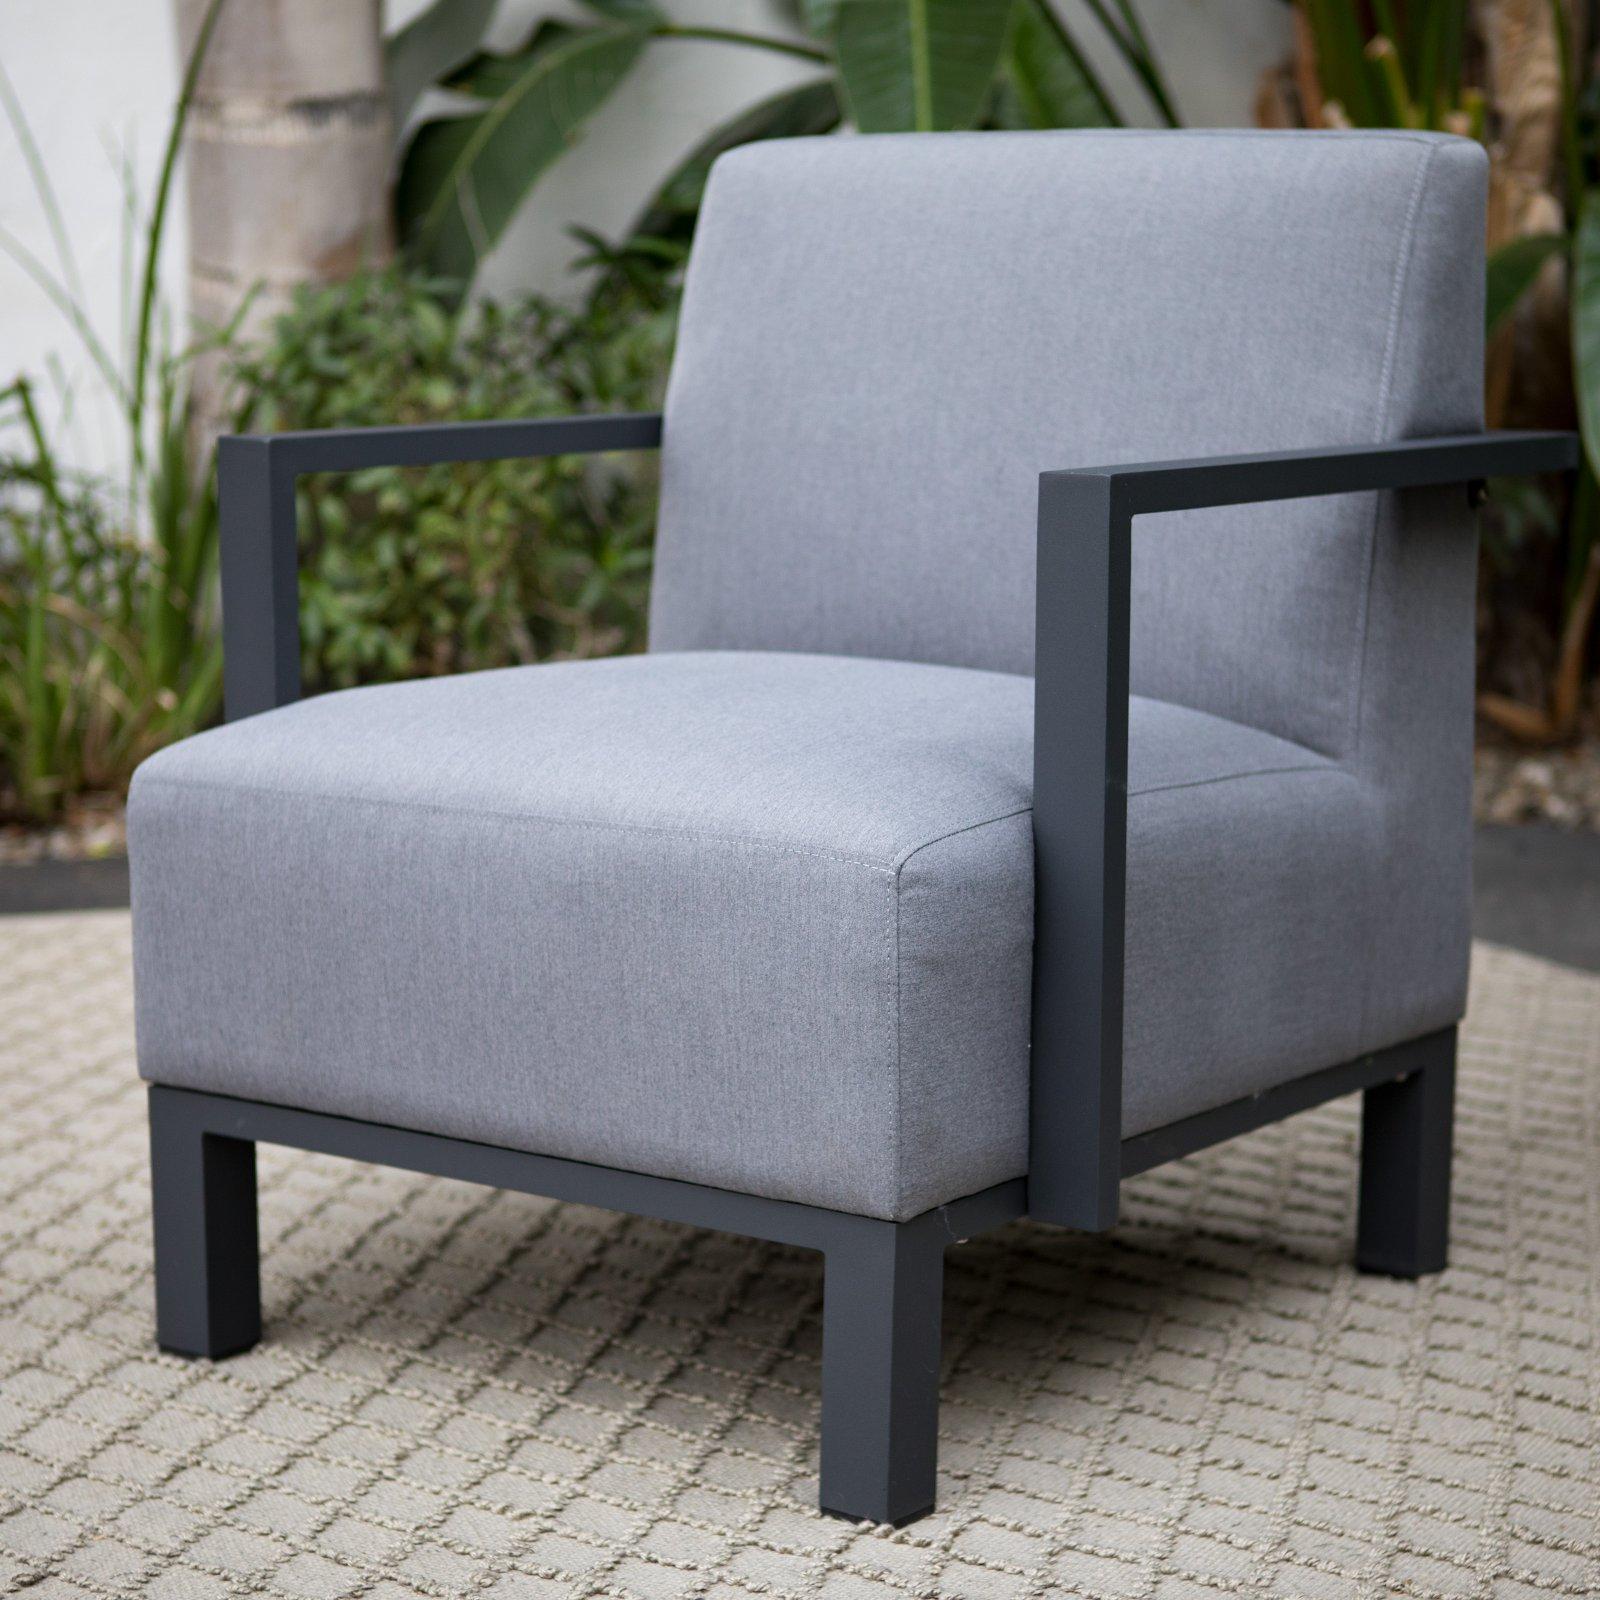 Strange Belham Living Lied Outdoor Upholstered Deep Seating Lounge Pdpeps Interior Chair Design Pdpepsorg